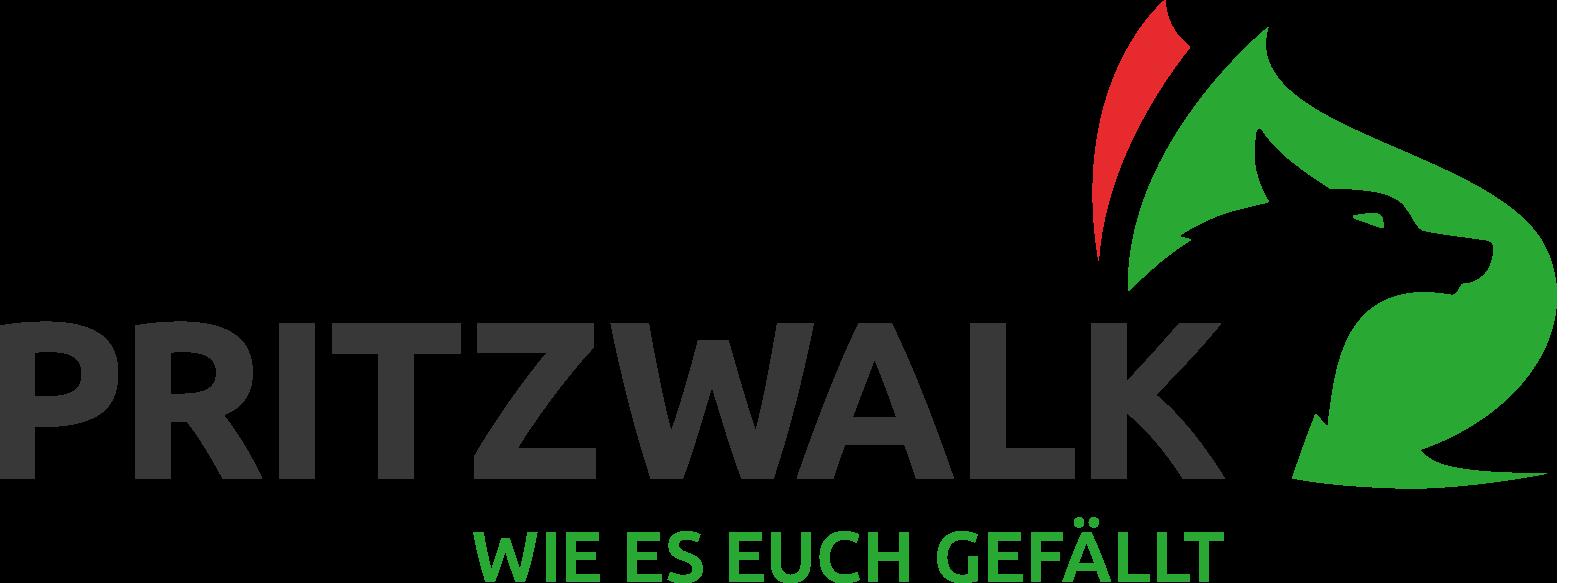 pritzwalk_logo_rgb